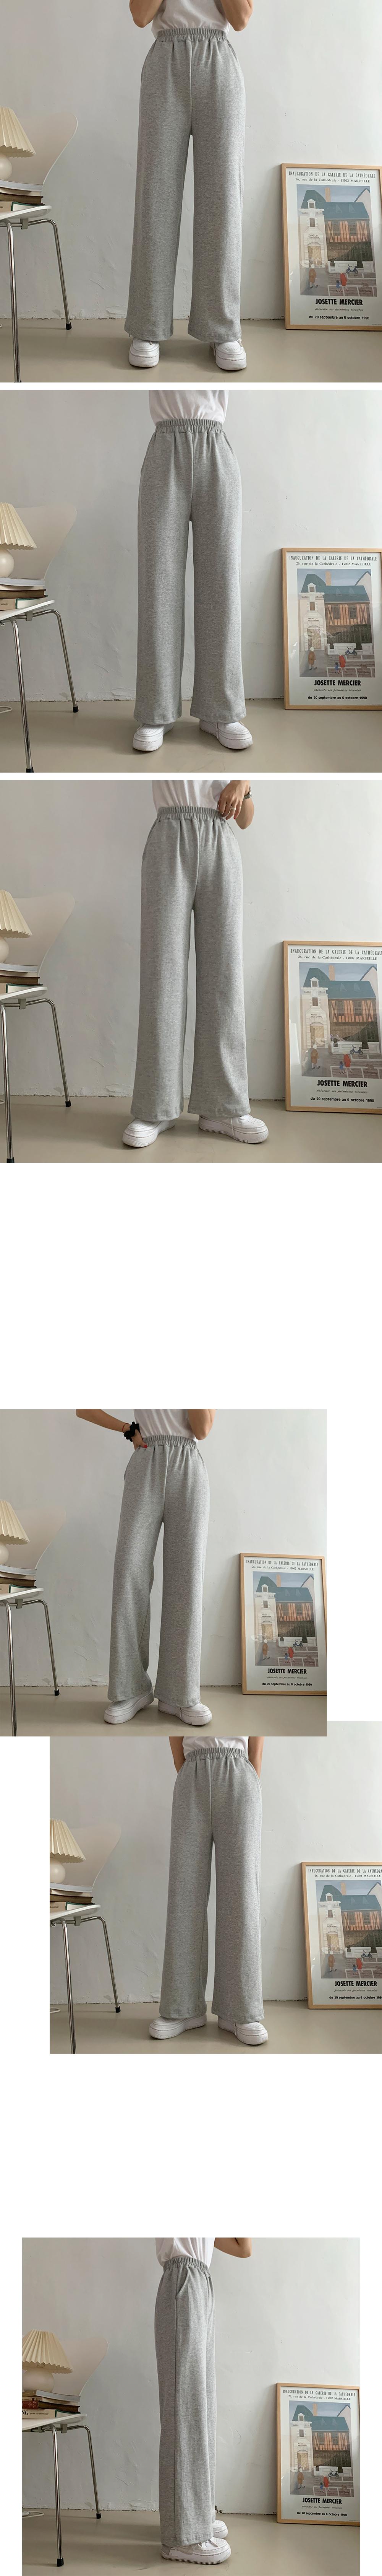 Stan Basic Training Pants